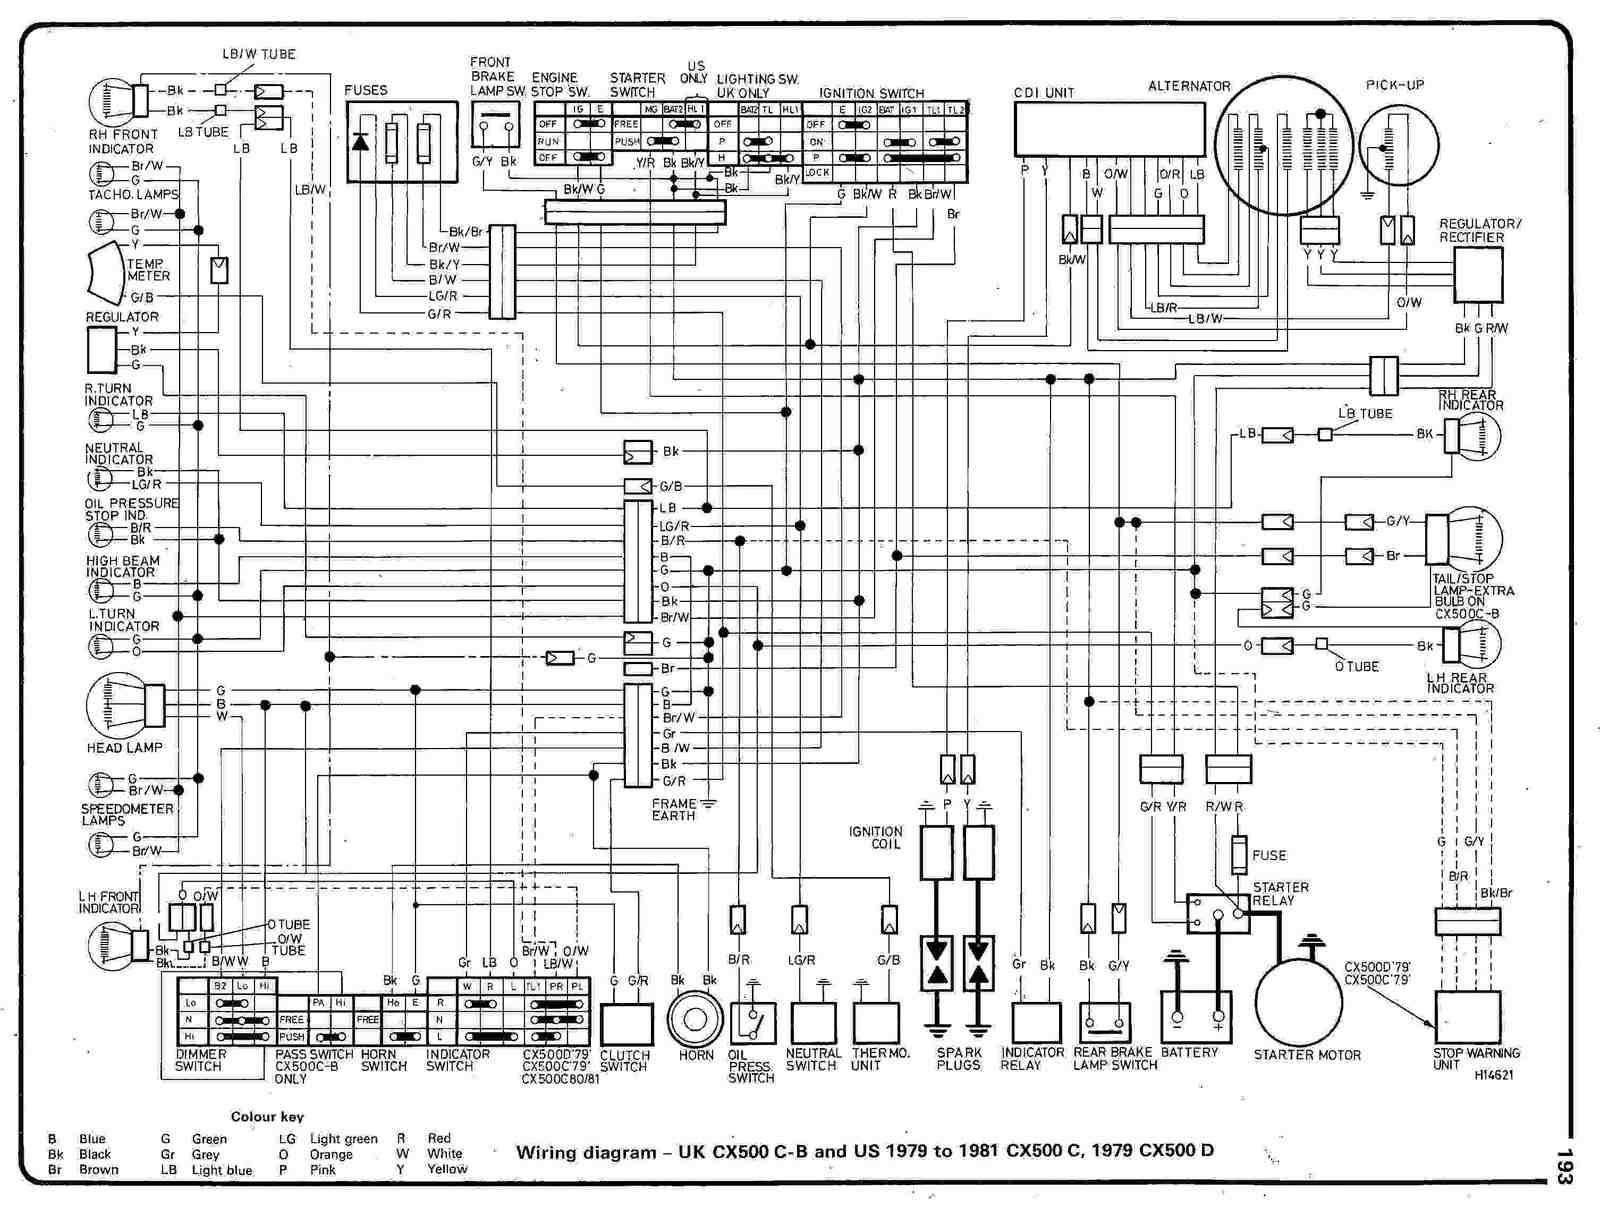 Pretty Stratocaster Wiring Mods Tall Car Alarm System Diagram Flat Car Alarm Wiring Guitar 3 Way Switch Old Dimarzio Push Pull Pot SoftGuitar Tone Wiring Suzuki Wiring Diagram Motorcycle   Efcaviation